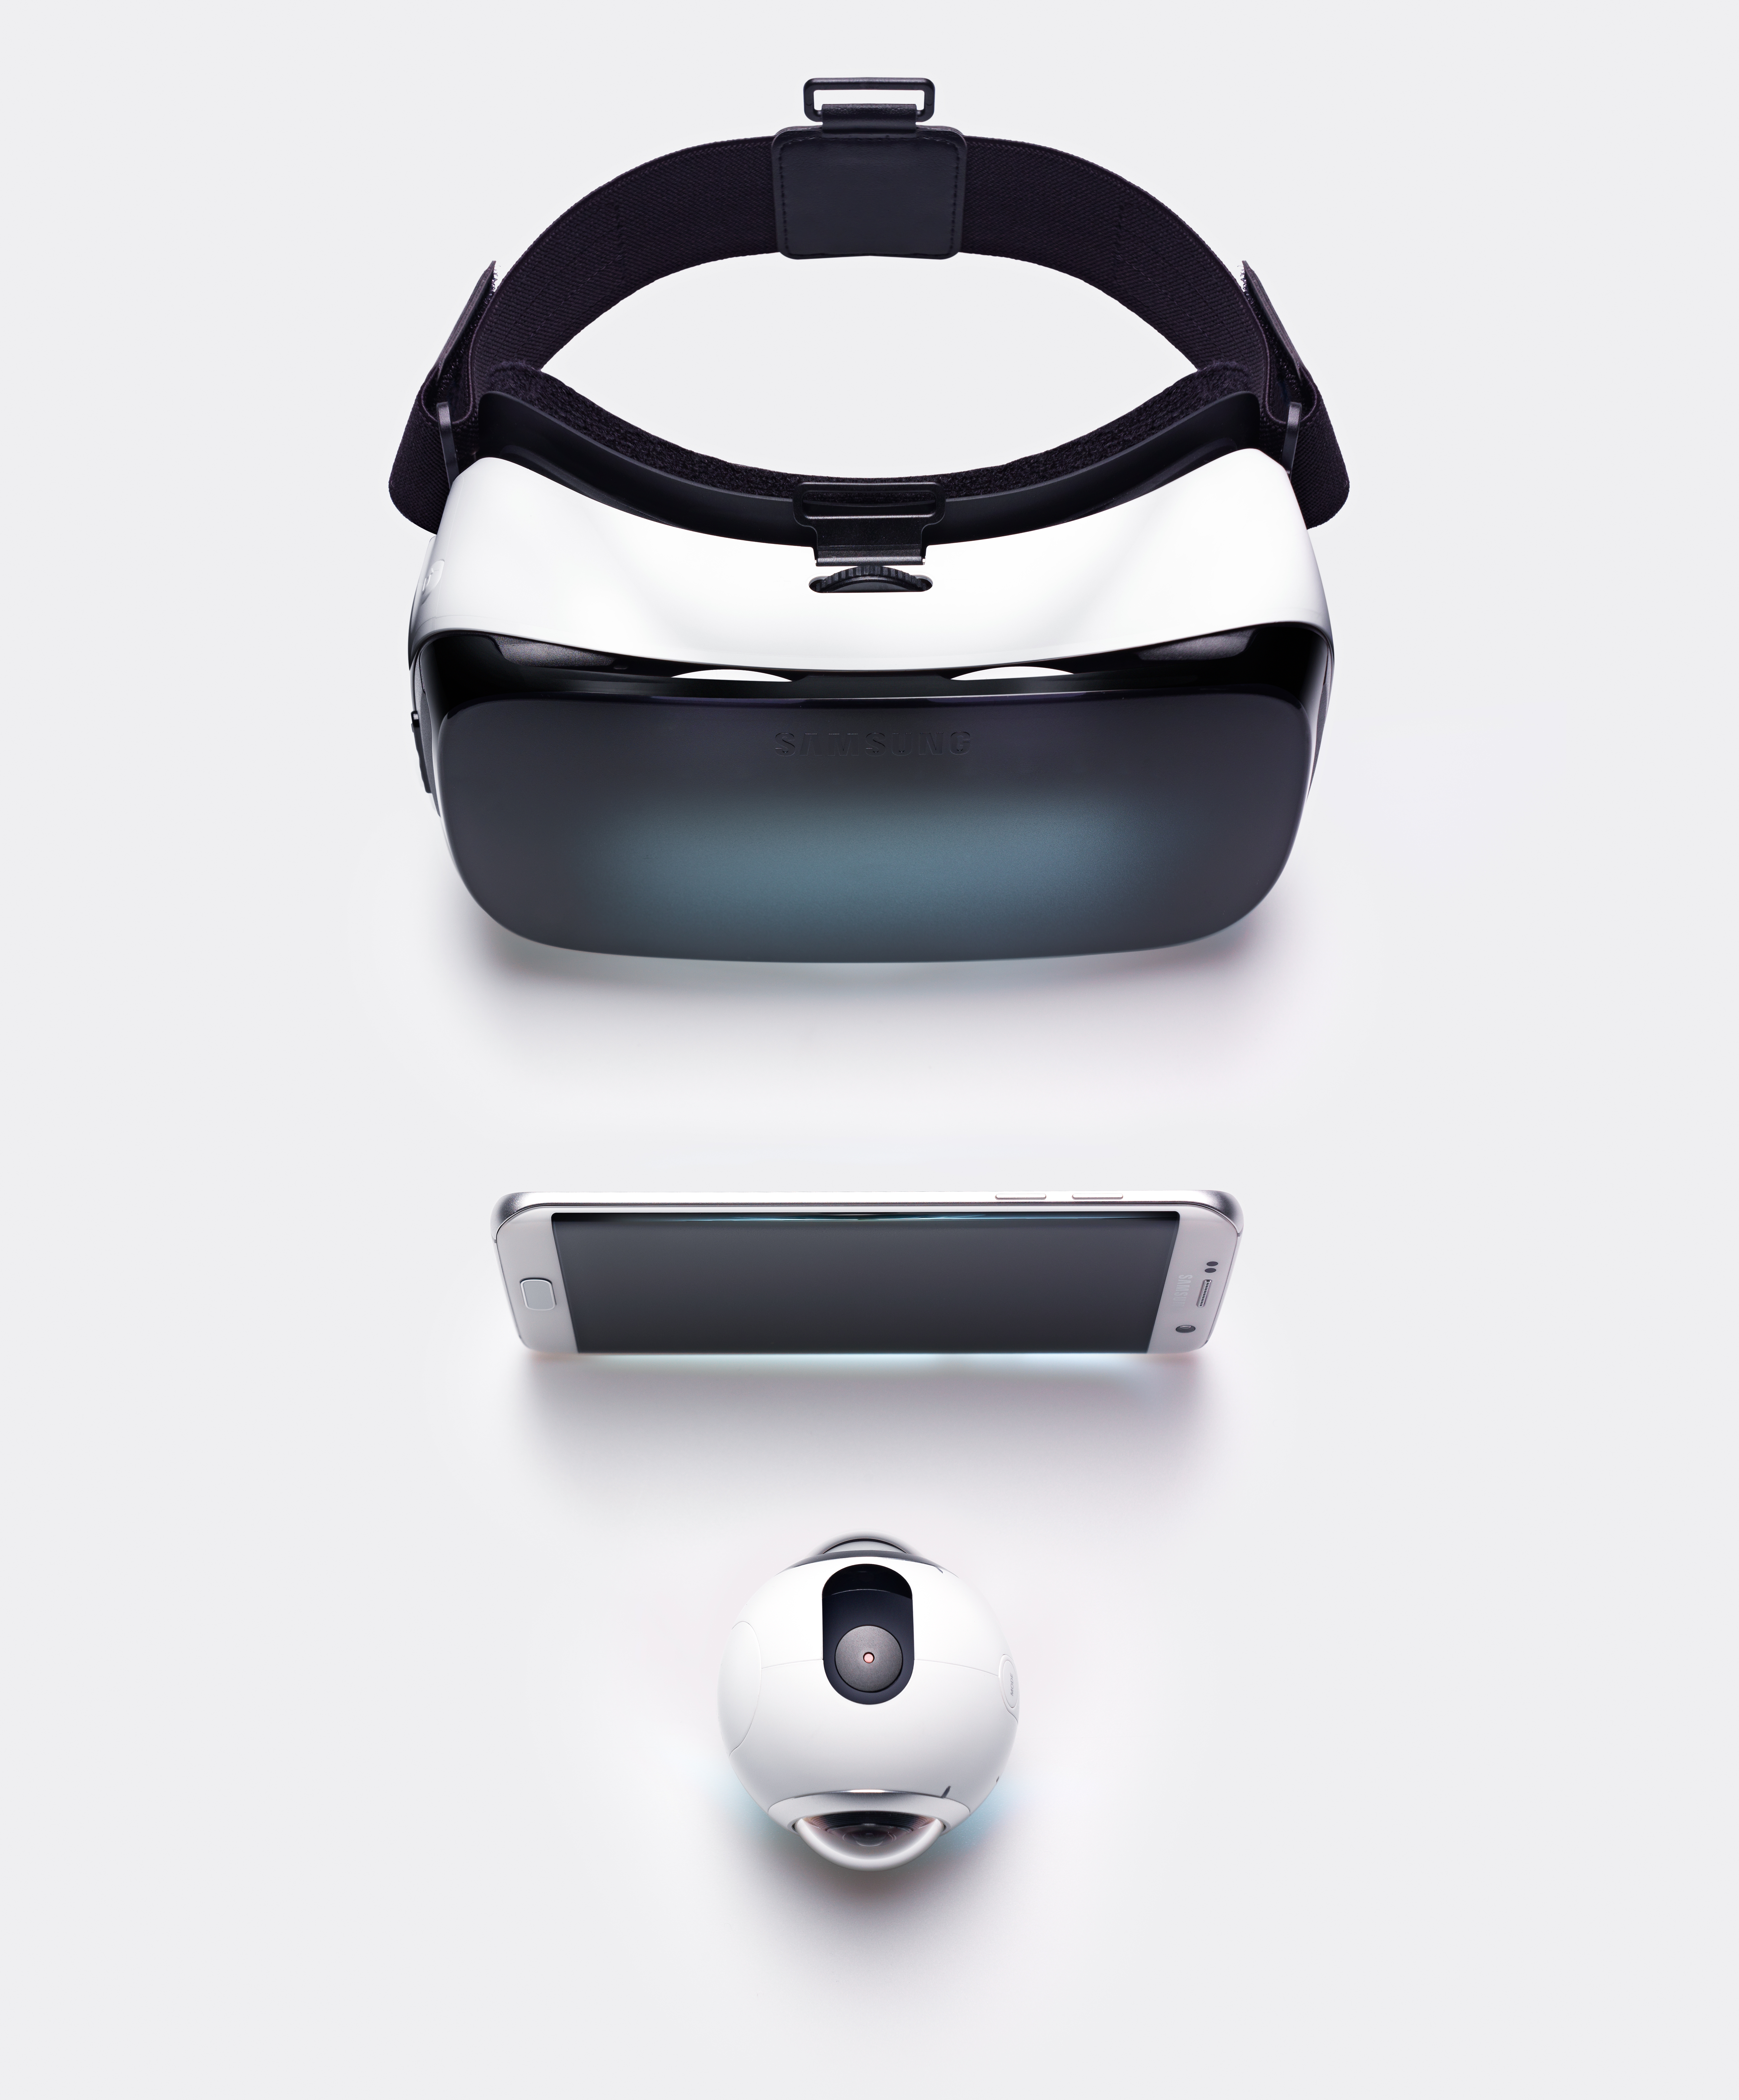 aaee382d0 360° ekosystém virtuálnej reality od firmy Samsung   TOUCHIT